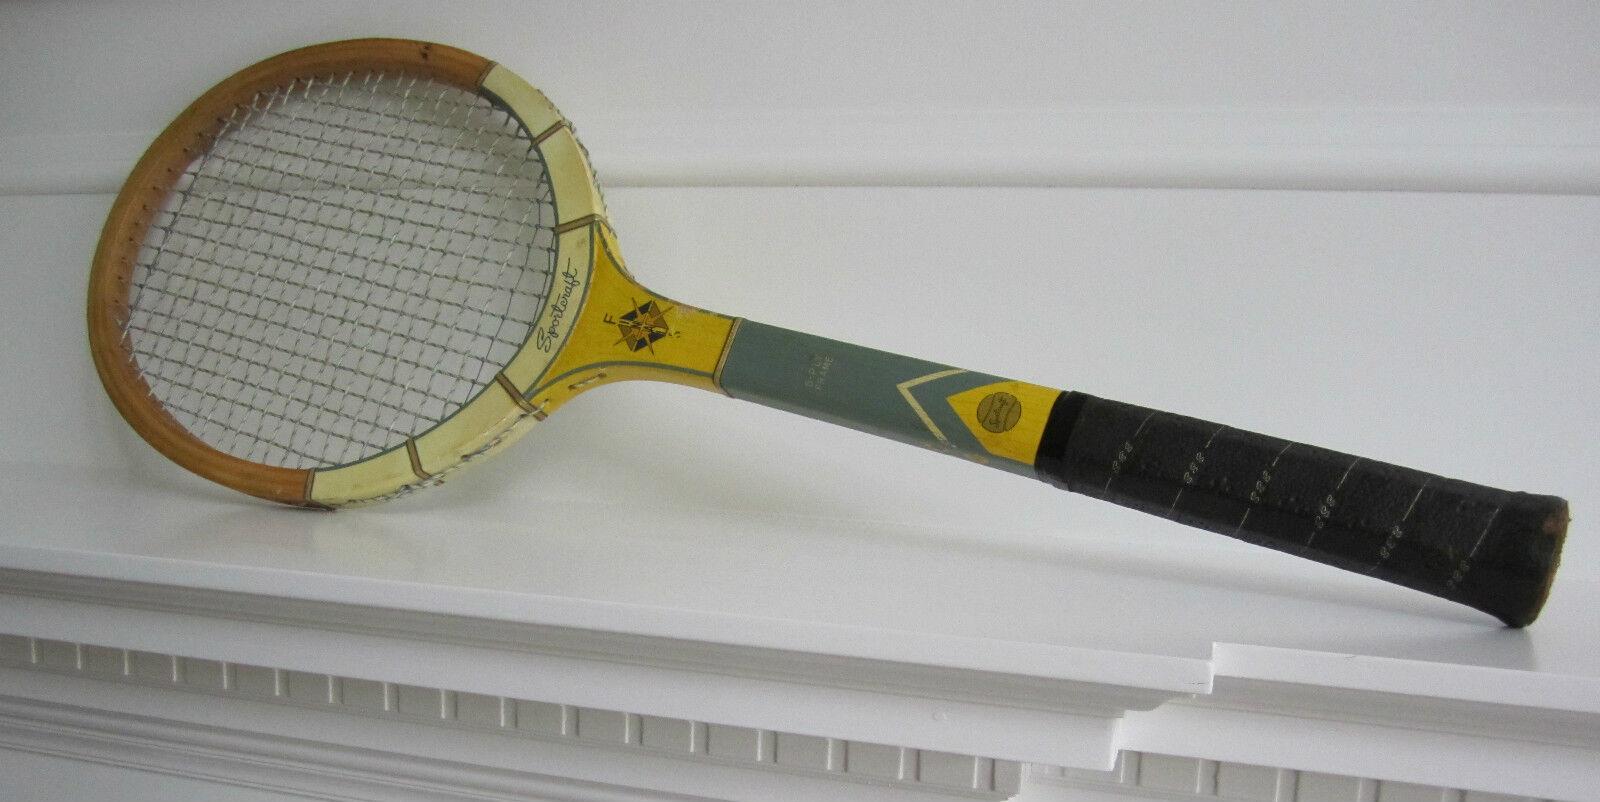 Sportcraft bois Vintage Tennis Racquet 4 5 8  boisen 5-Ply Frame Beautiful